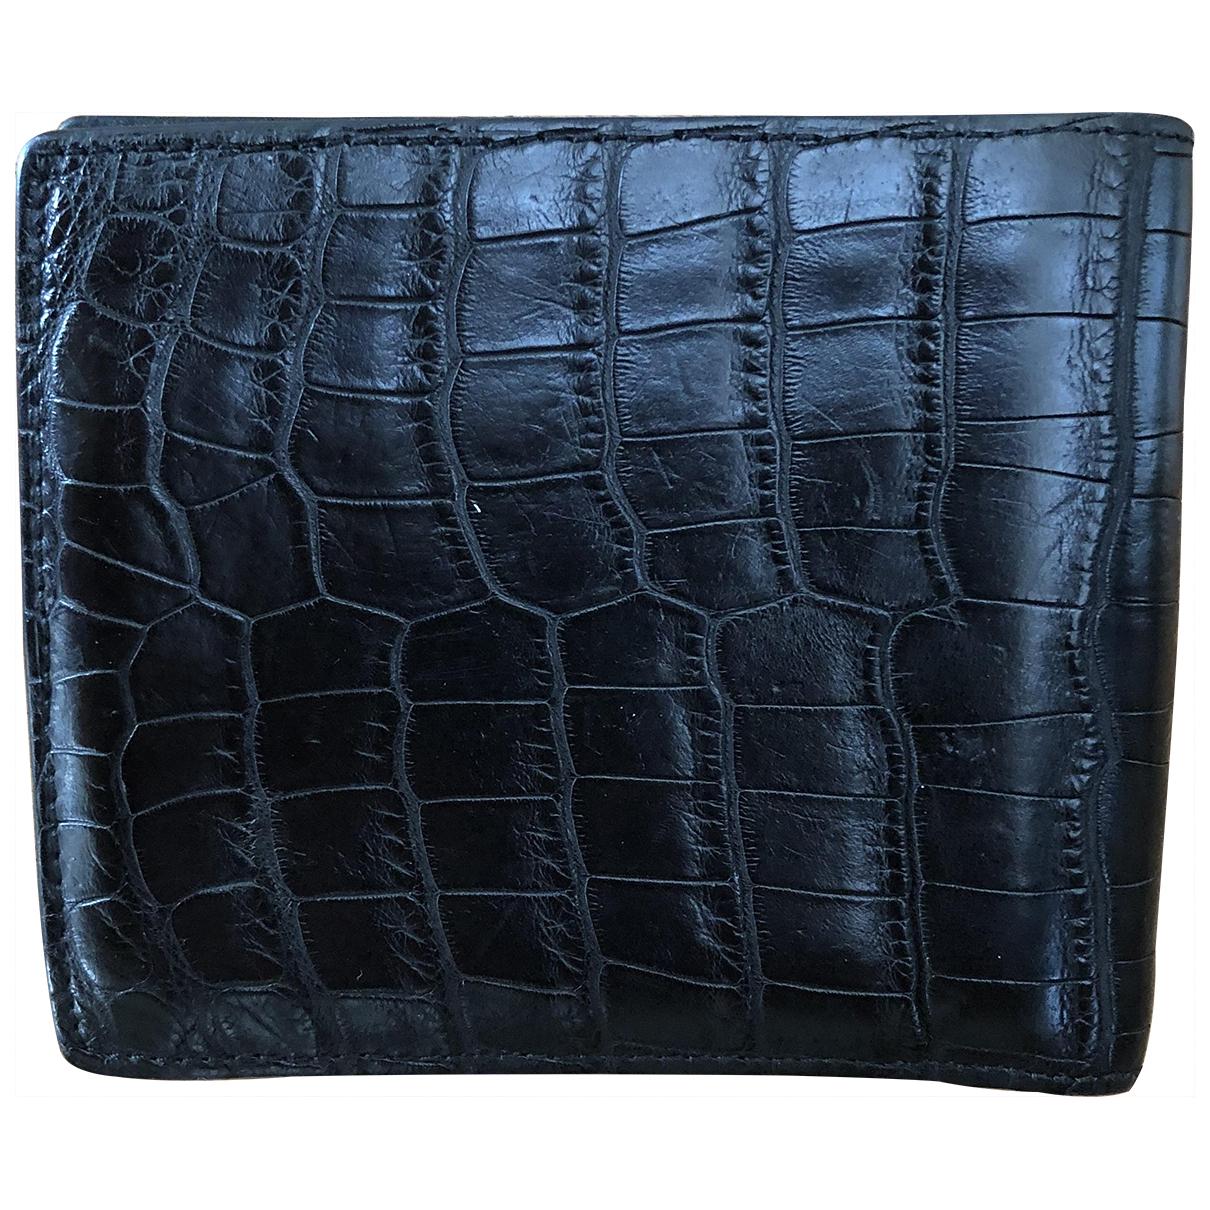 Alfred Dunhill \N Black Crocodile Small bag, wallet & cases for Men \N